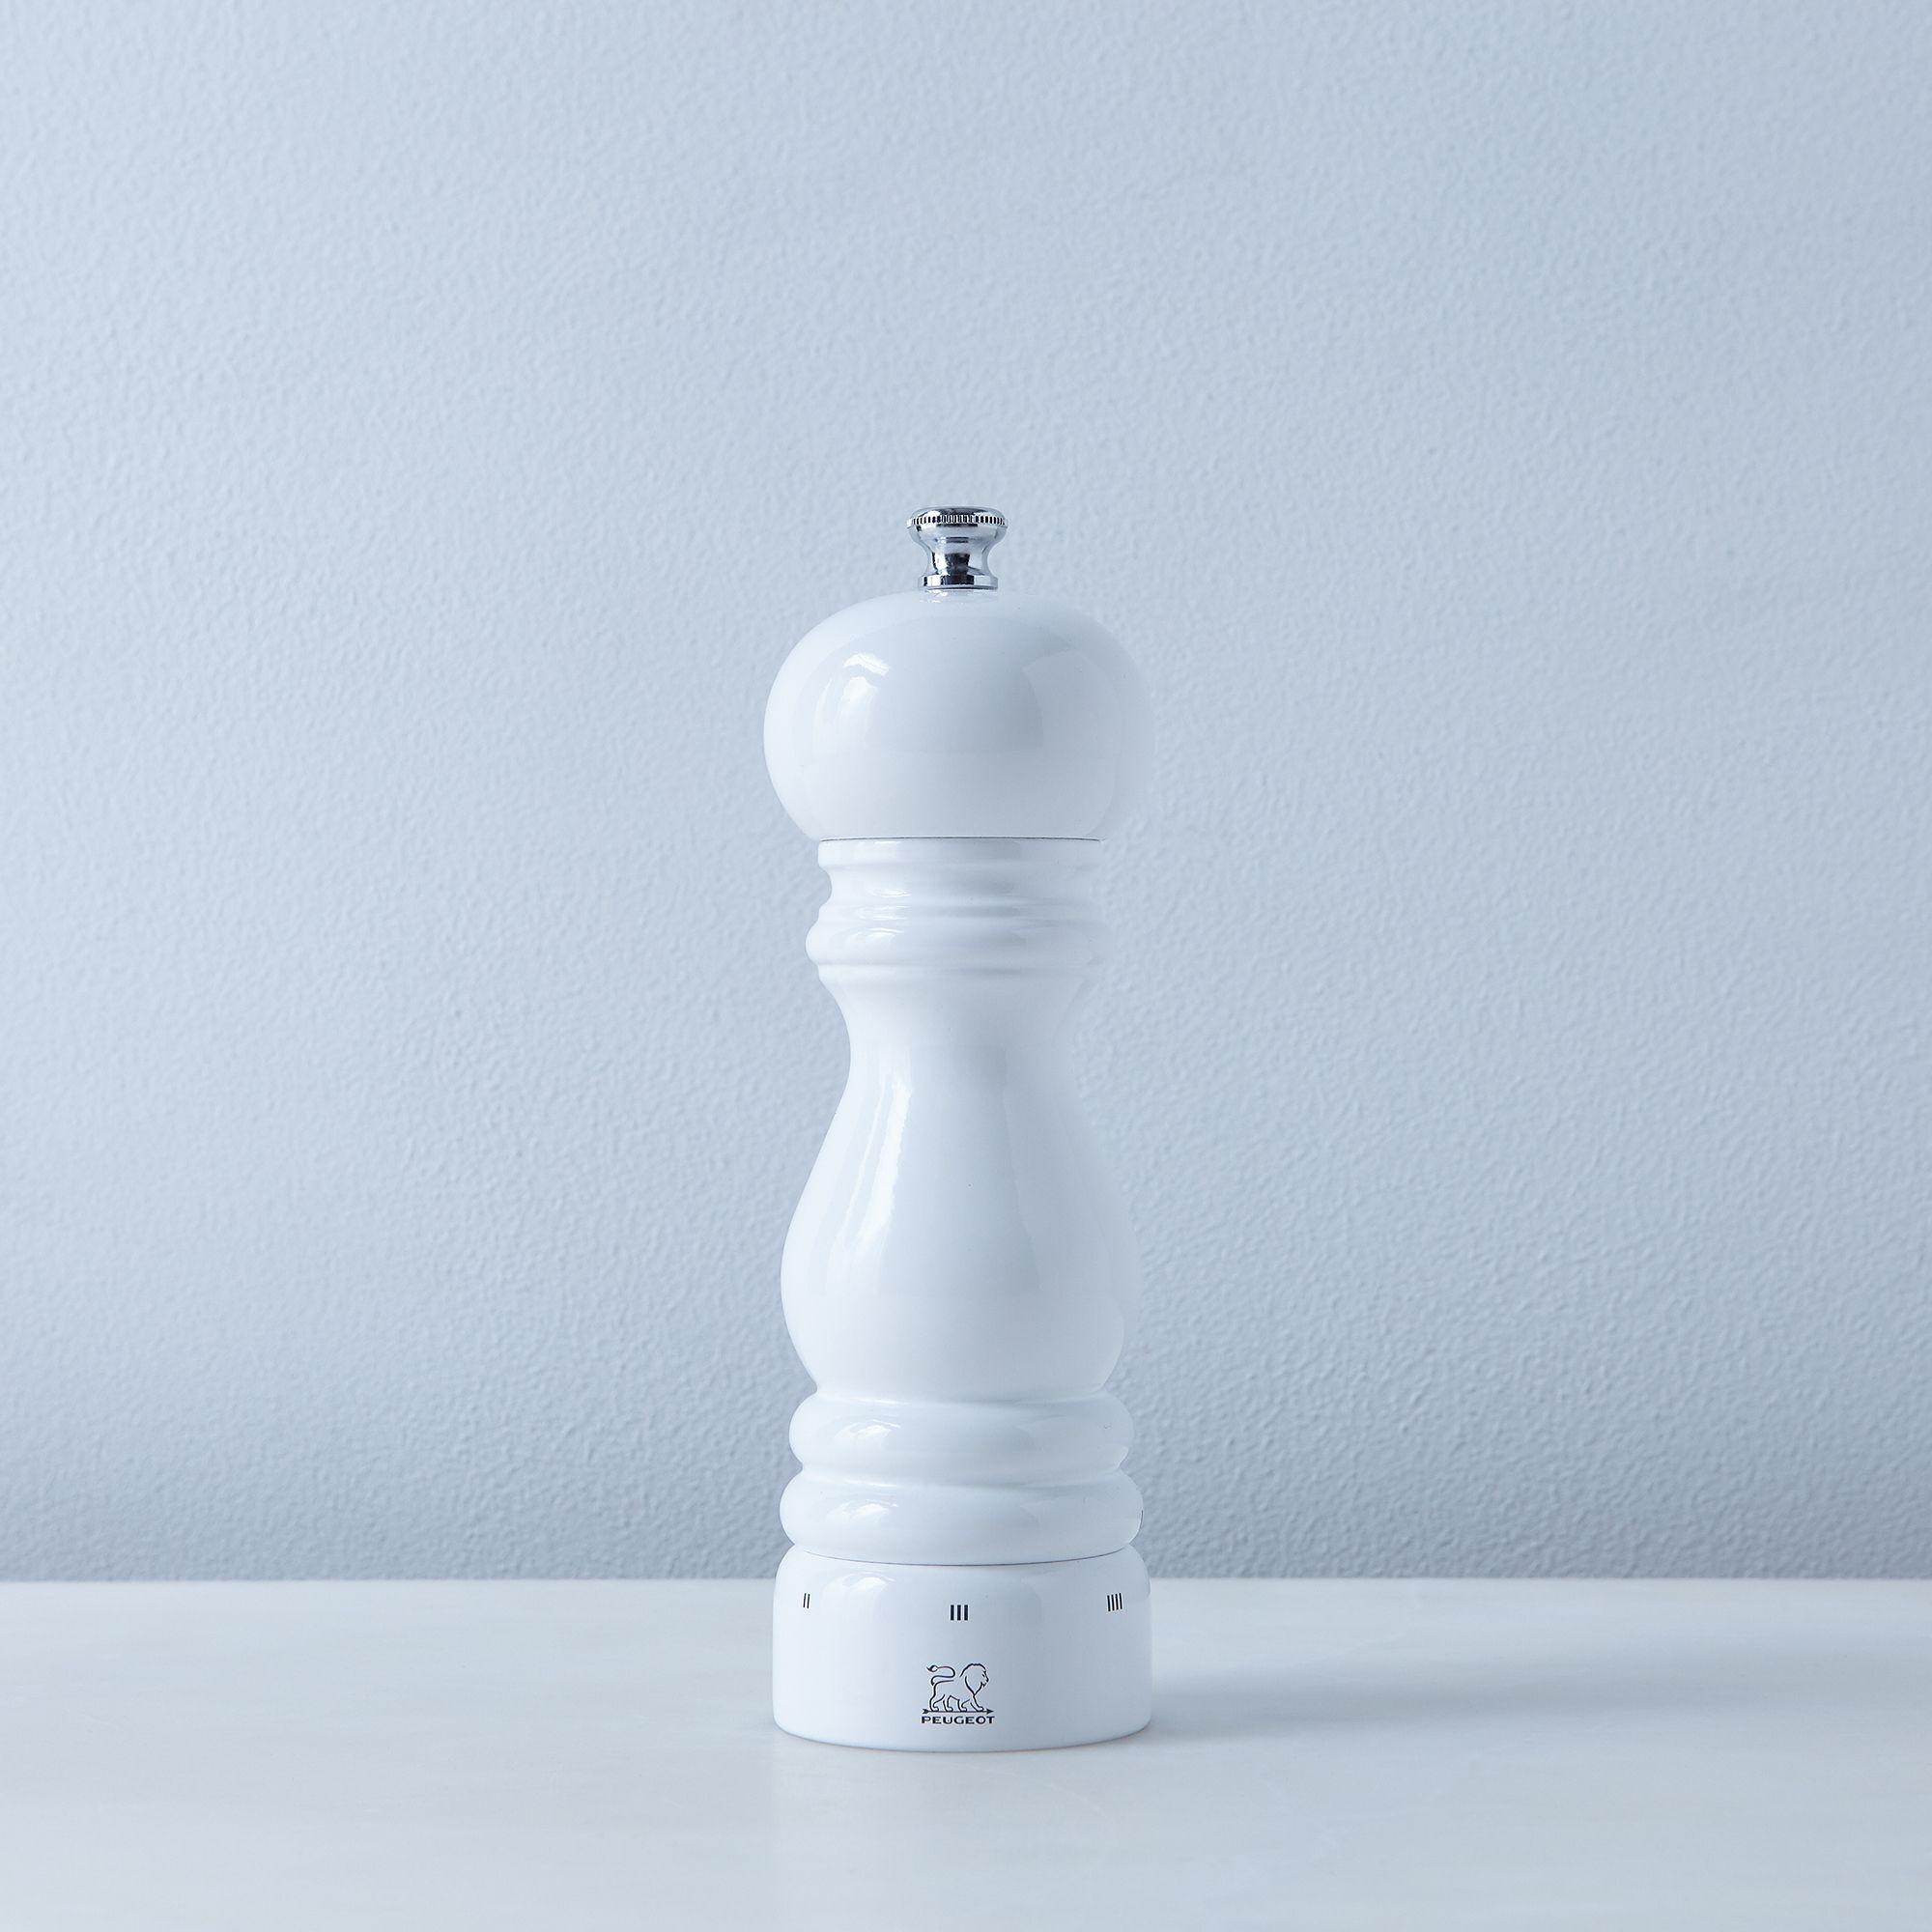 902e6c35 aac5 44fd bf07 eeb983c14119  2016 0628 peugeot paris uselect white 7 inch pepper mill silo rocky luten 003